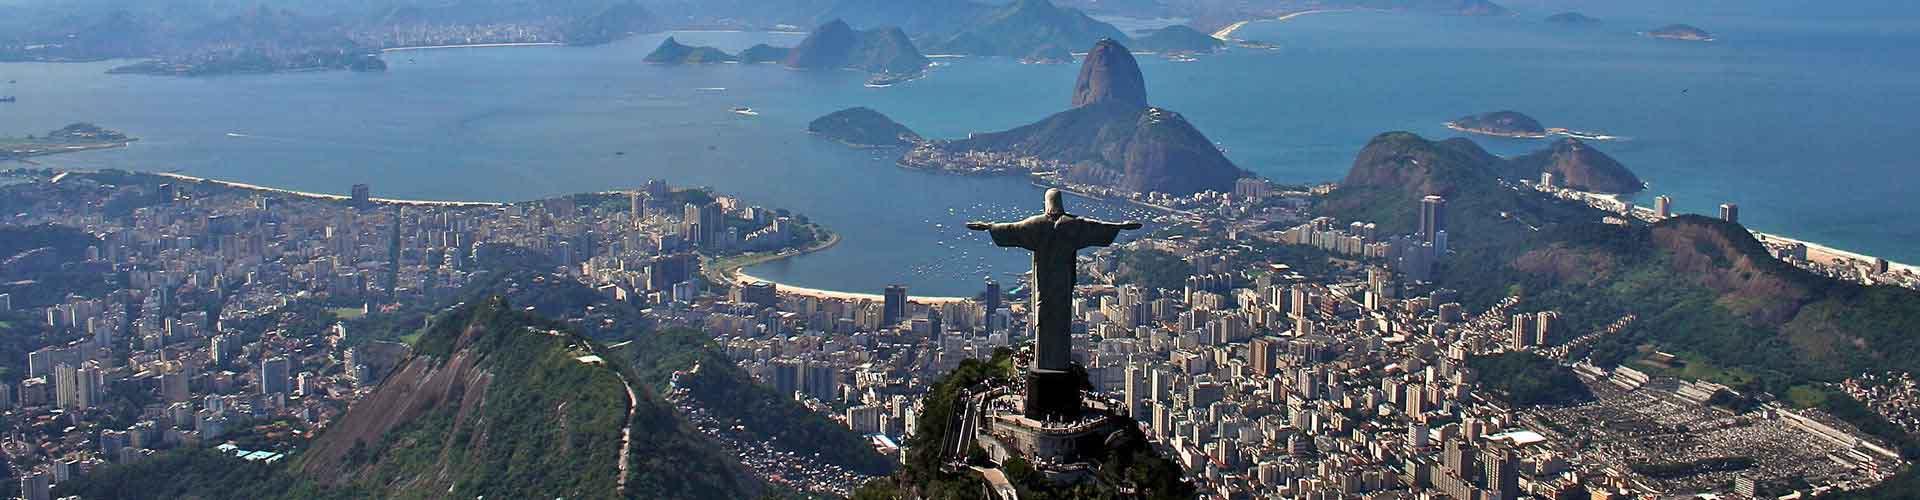 Rio de Janeiro – Hostellit kohteessa Rio de Janeiro. Rio de Janeiro -karttoja, valokuvia ja arvosteluja kaikista Rio de Janeiro -hostelleista.